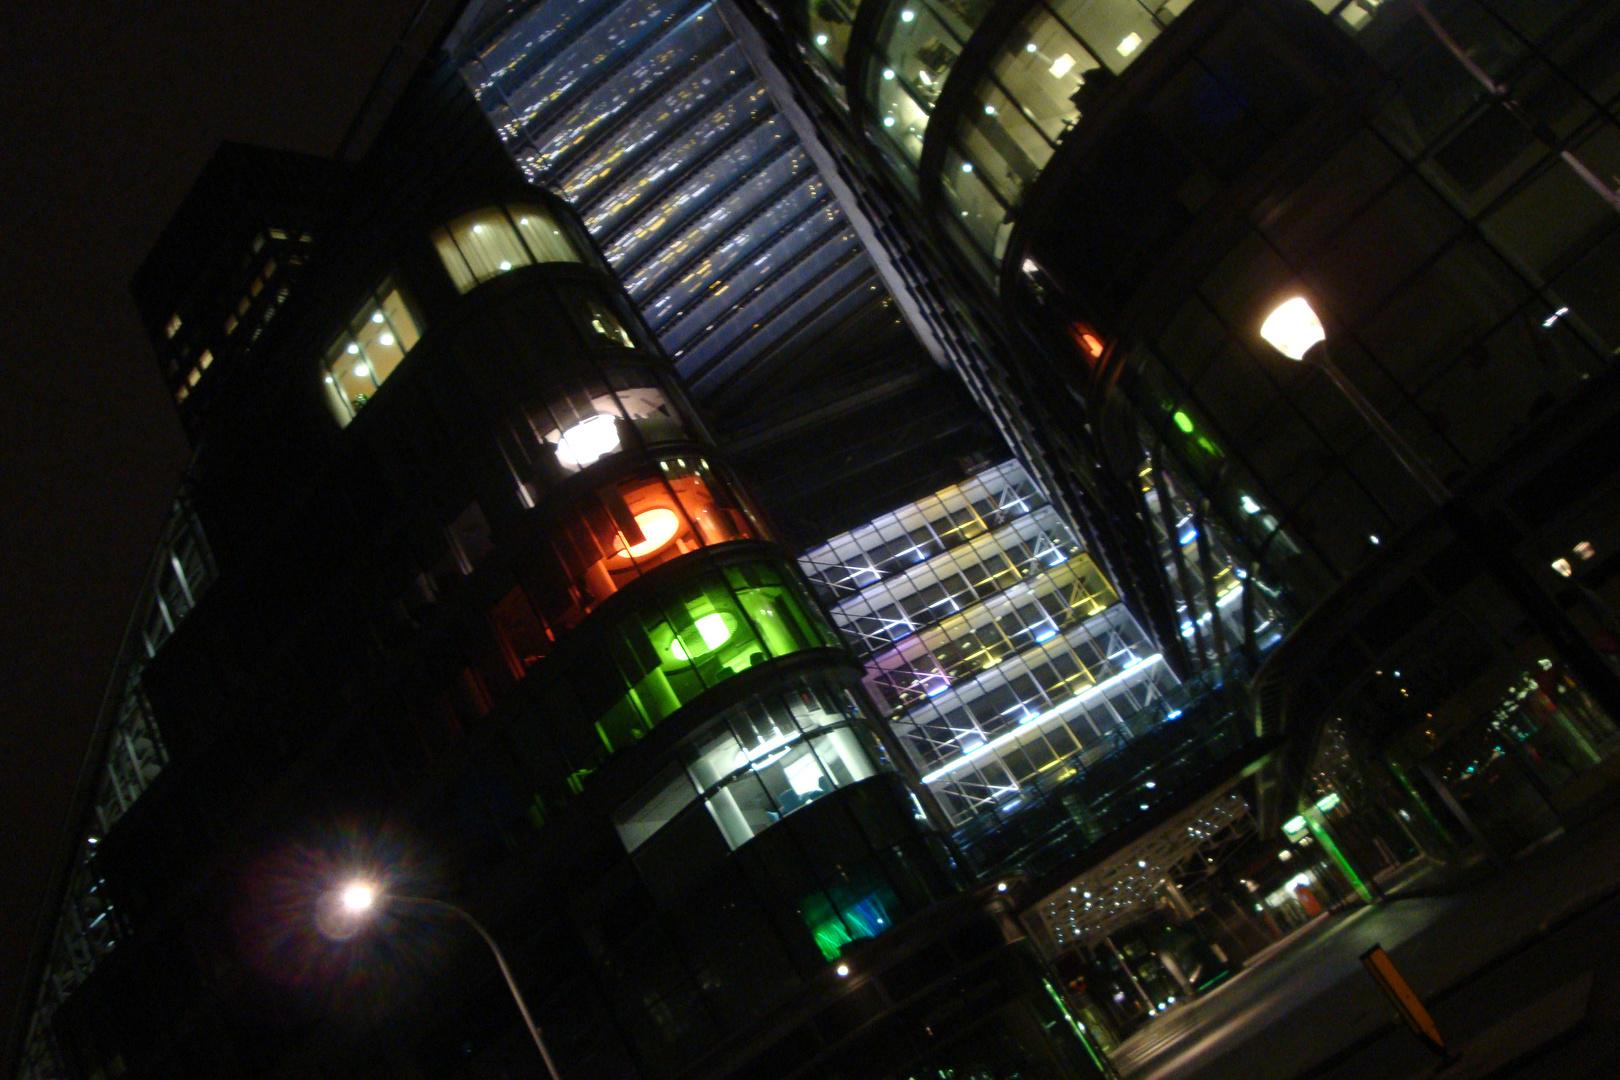 London, 01:55 am